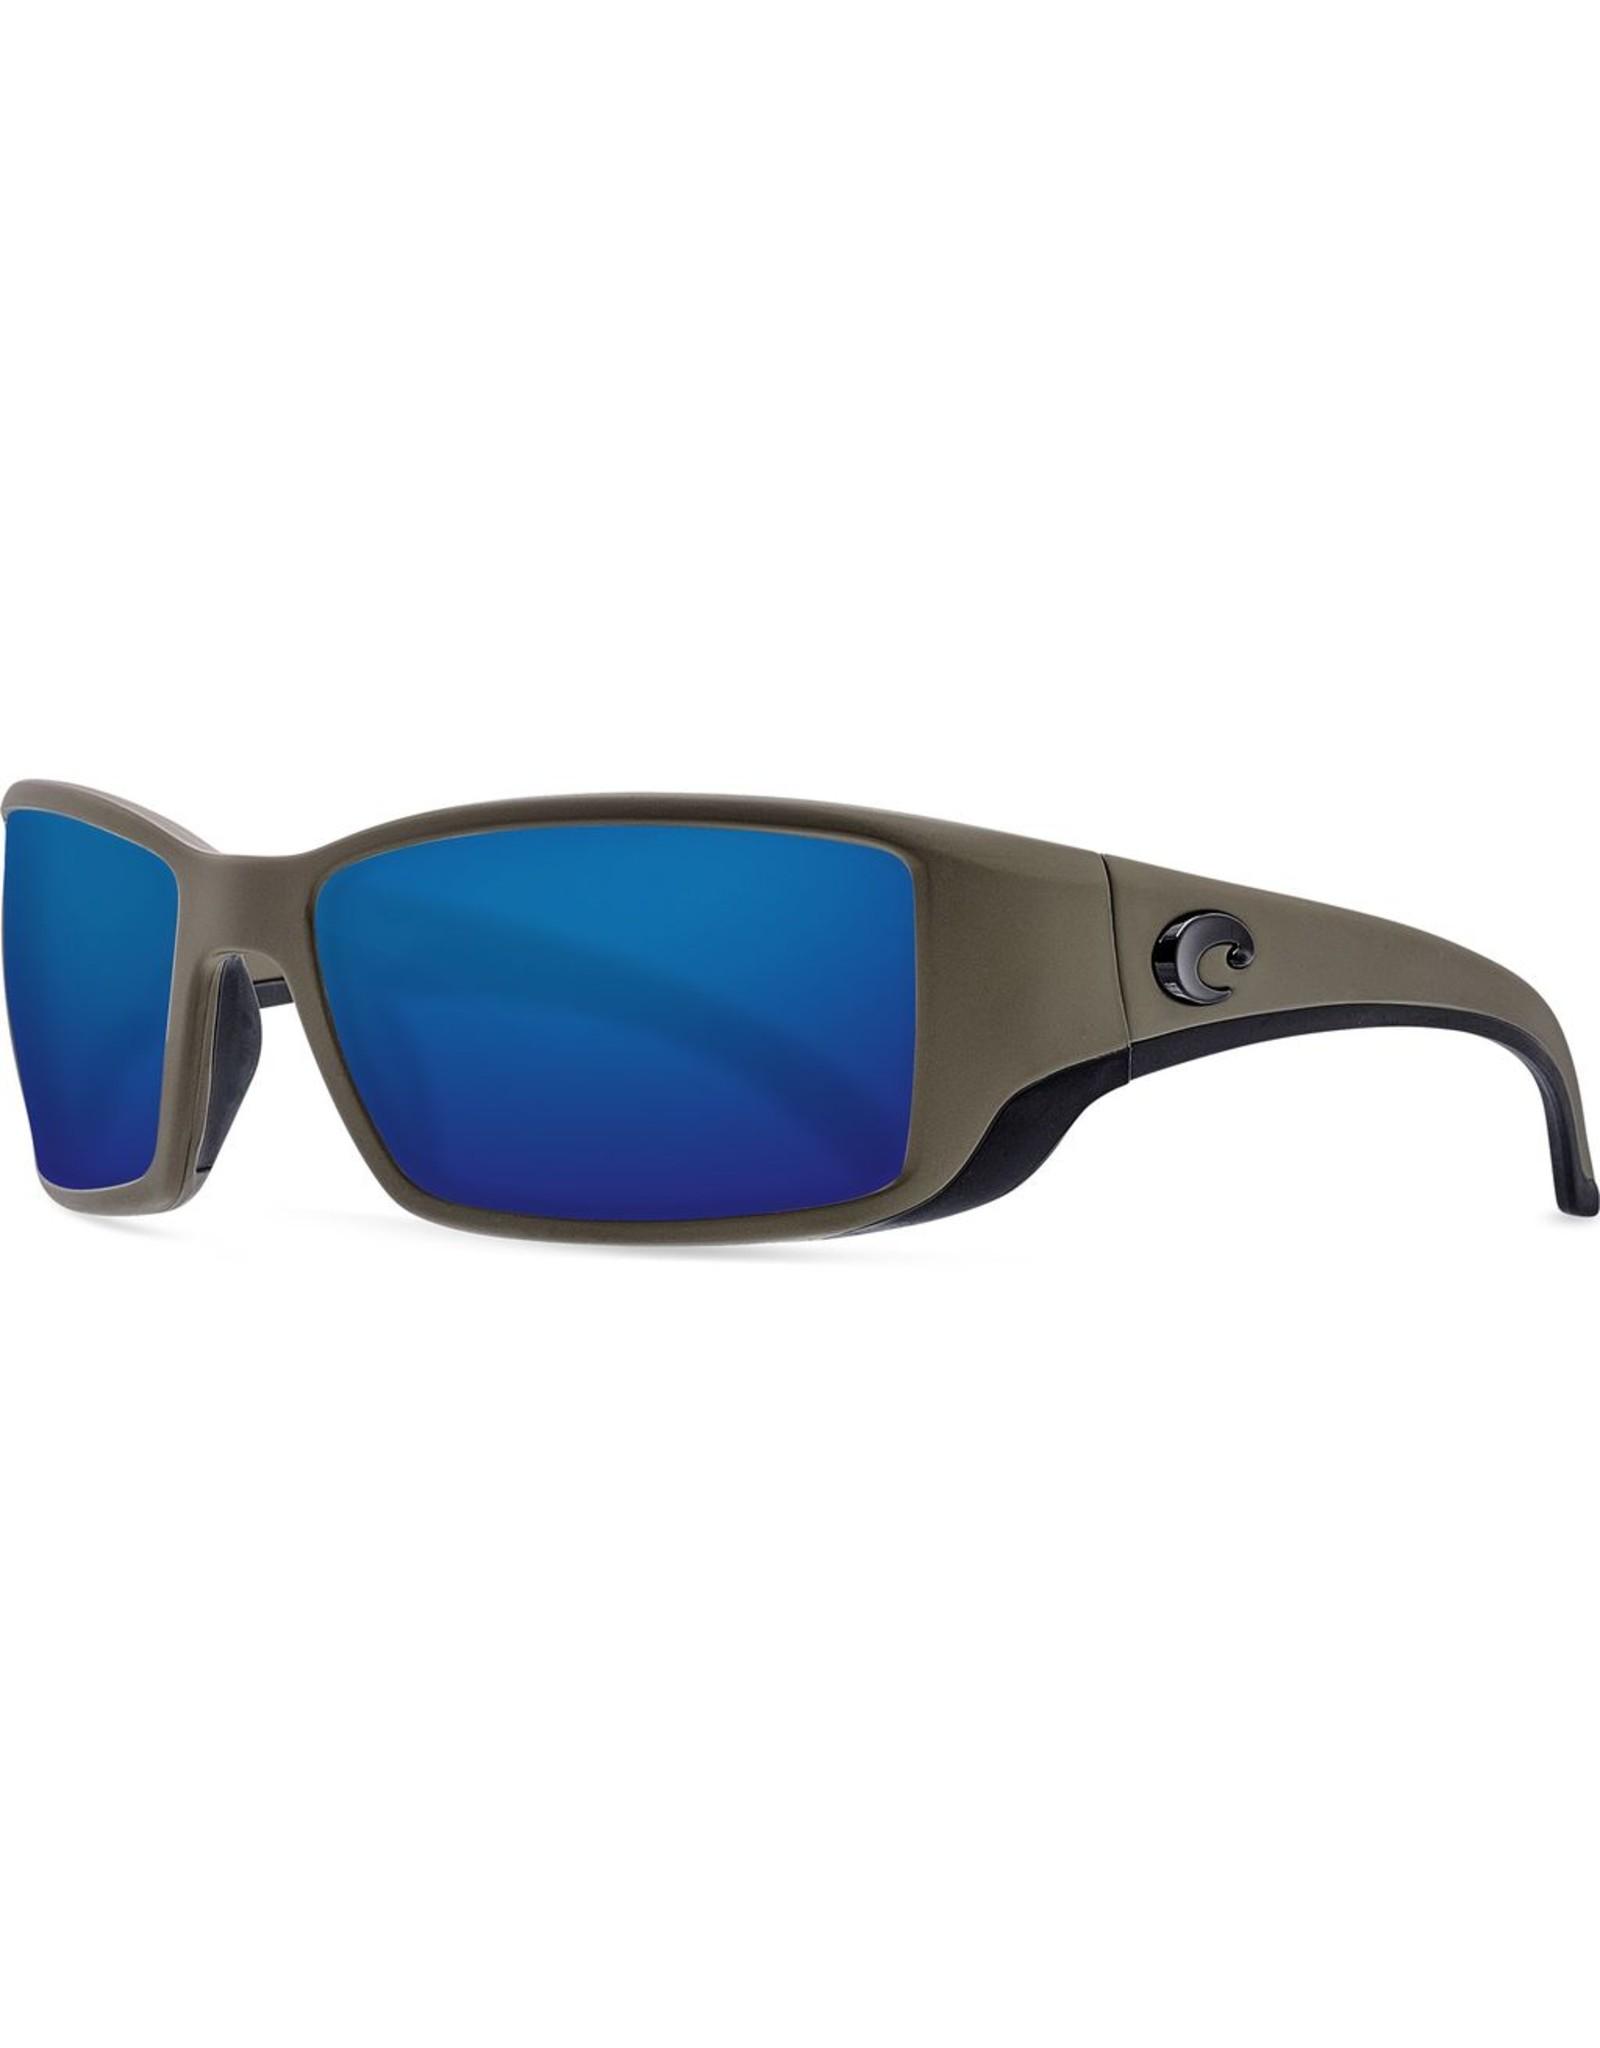 COSTA DEL MAR BLACKFIN - MOSS - BLUE MIRROR 580G